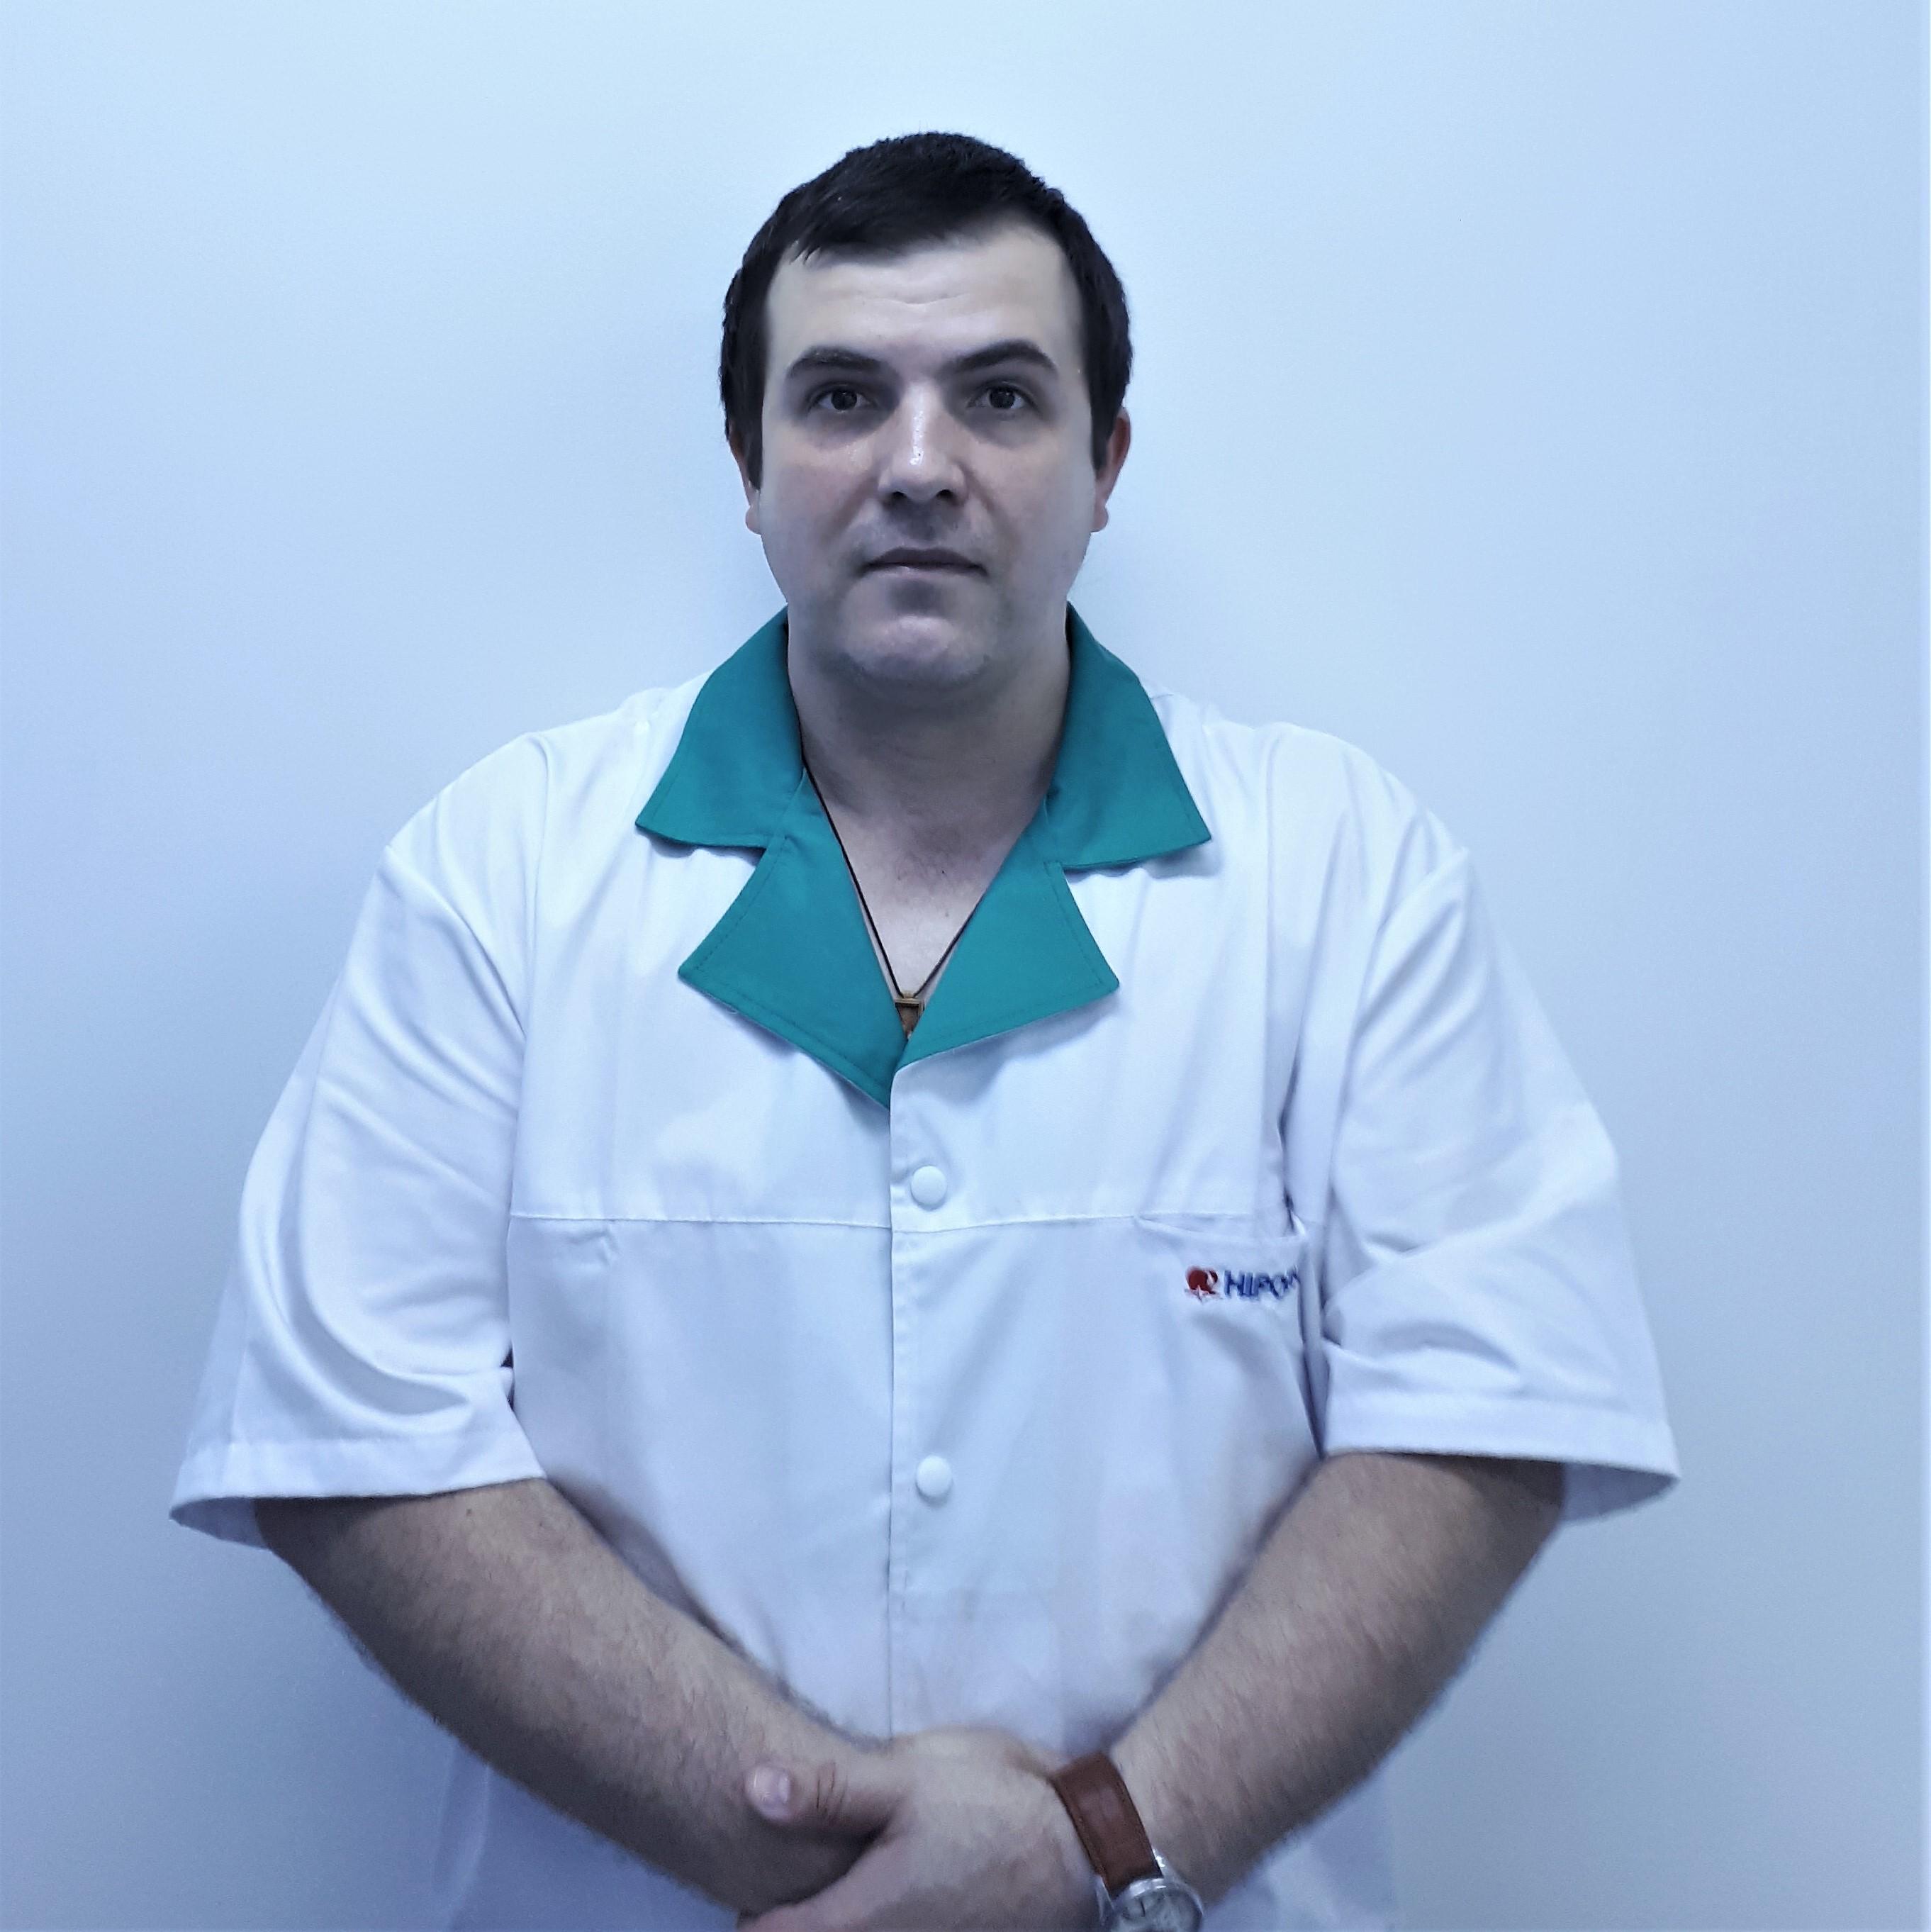 Dr. Stefan Andrei Bichis